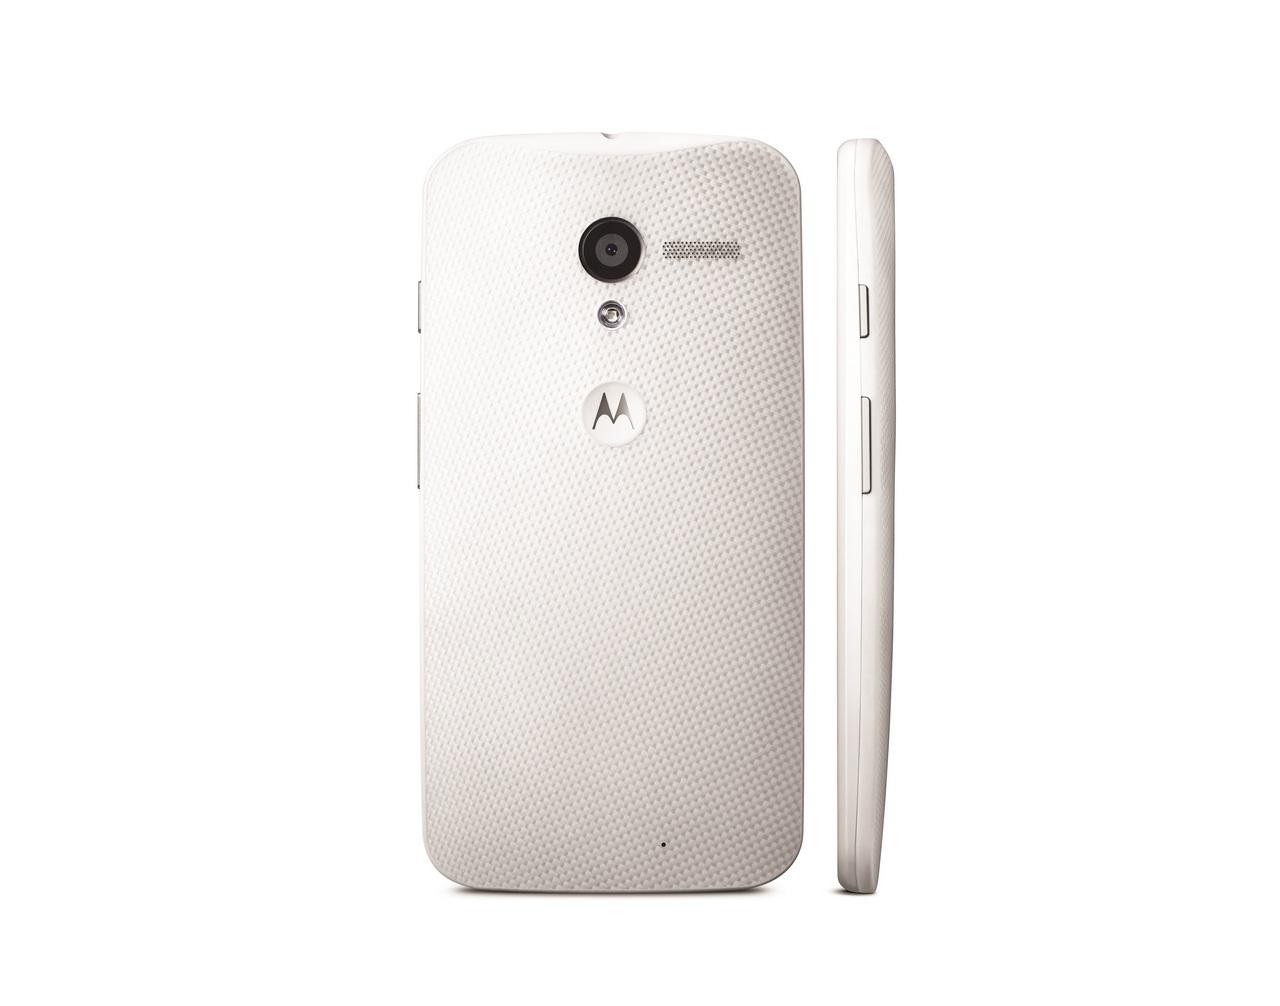 Motorola Mobility lanza Moto X en Argentina - TecnoGaming